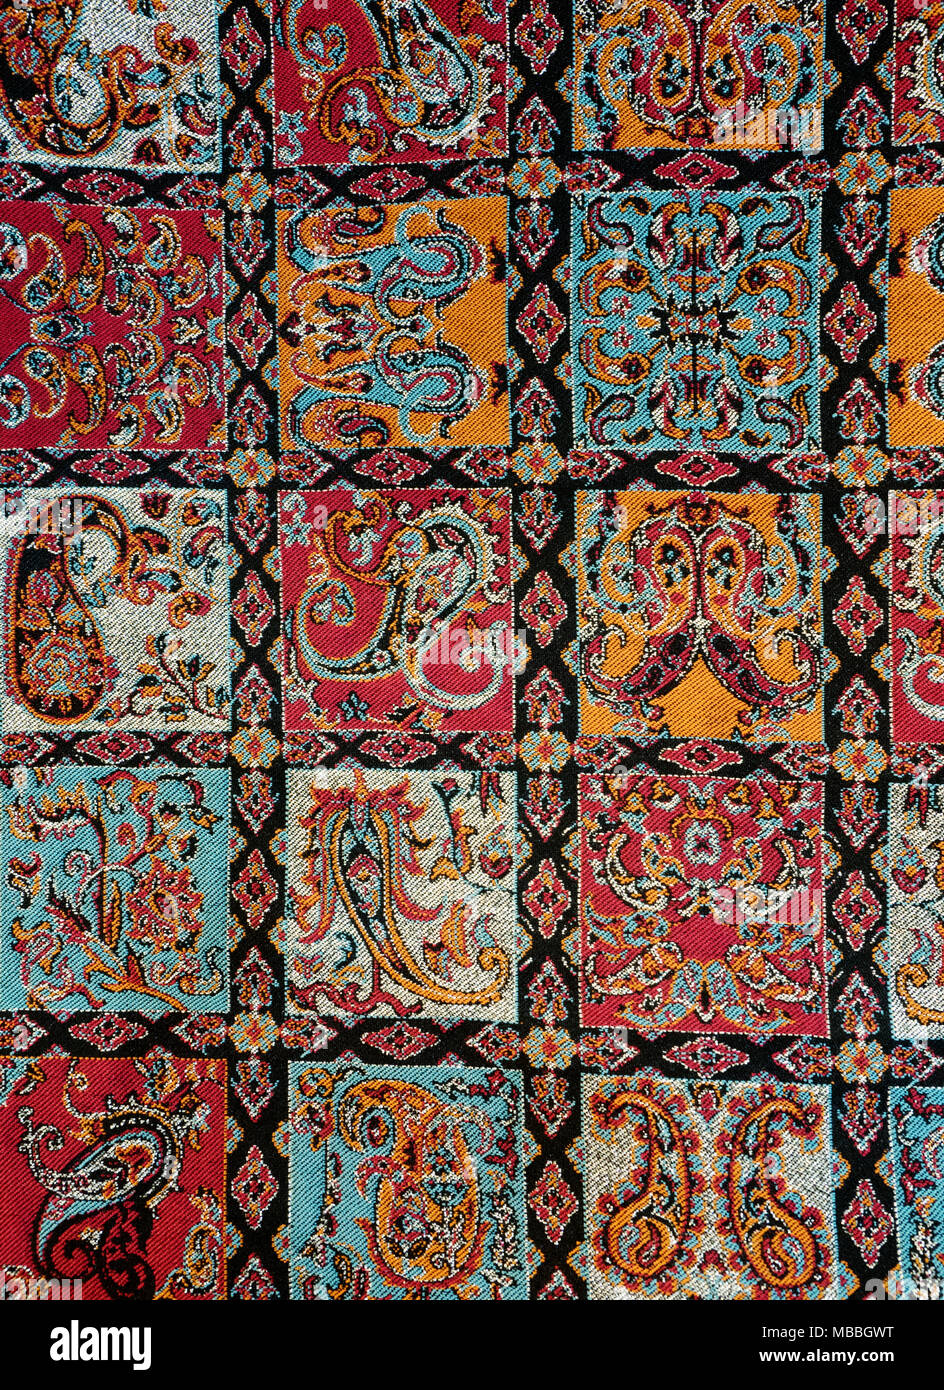 Colorful persian tablecloth ( termeh ) - Stock Image